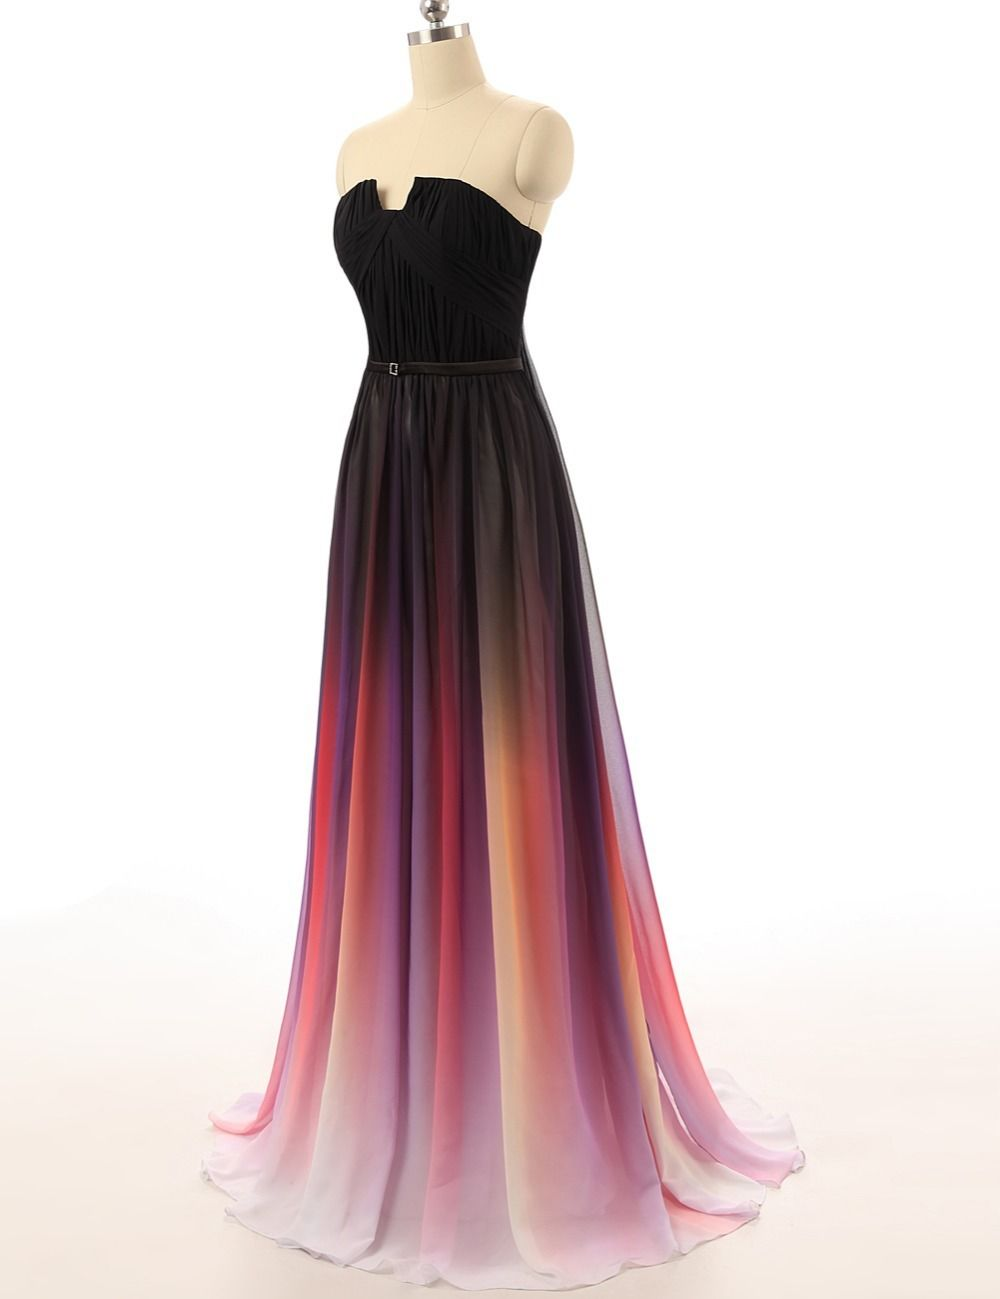 Ombre Prom Dresses Chiffon Prom Dresses Long Prom